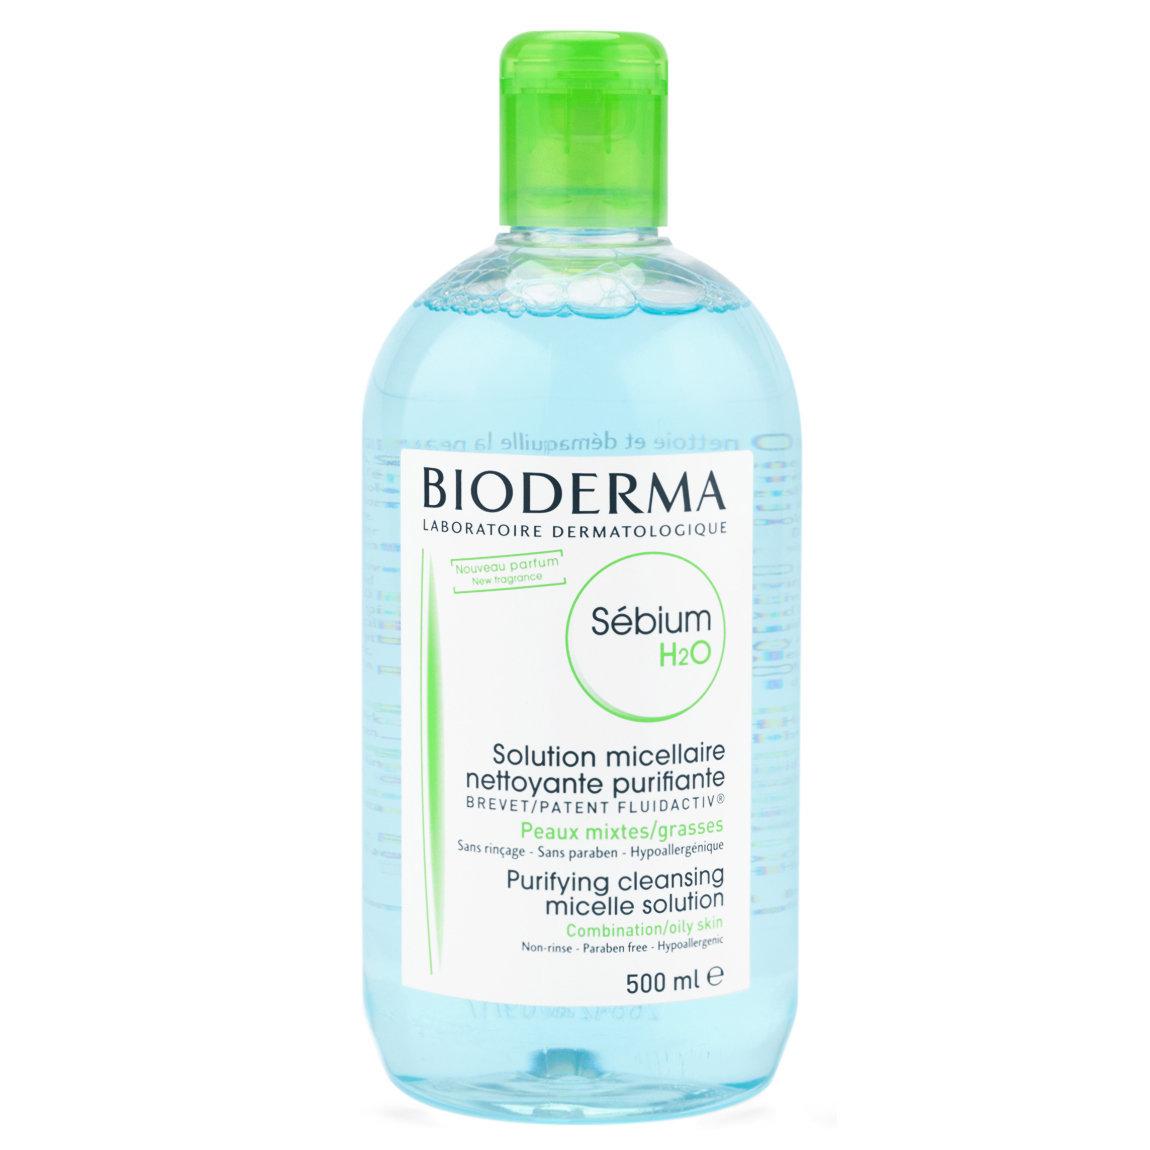 Bioderma Sébium H2O 500 ml alternative view 1 - product swatch.